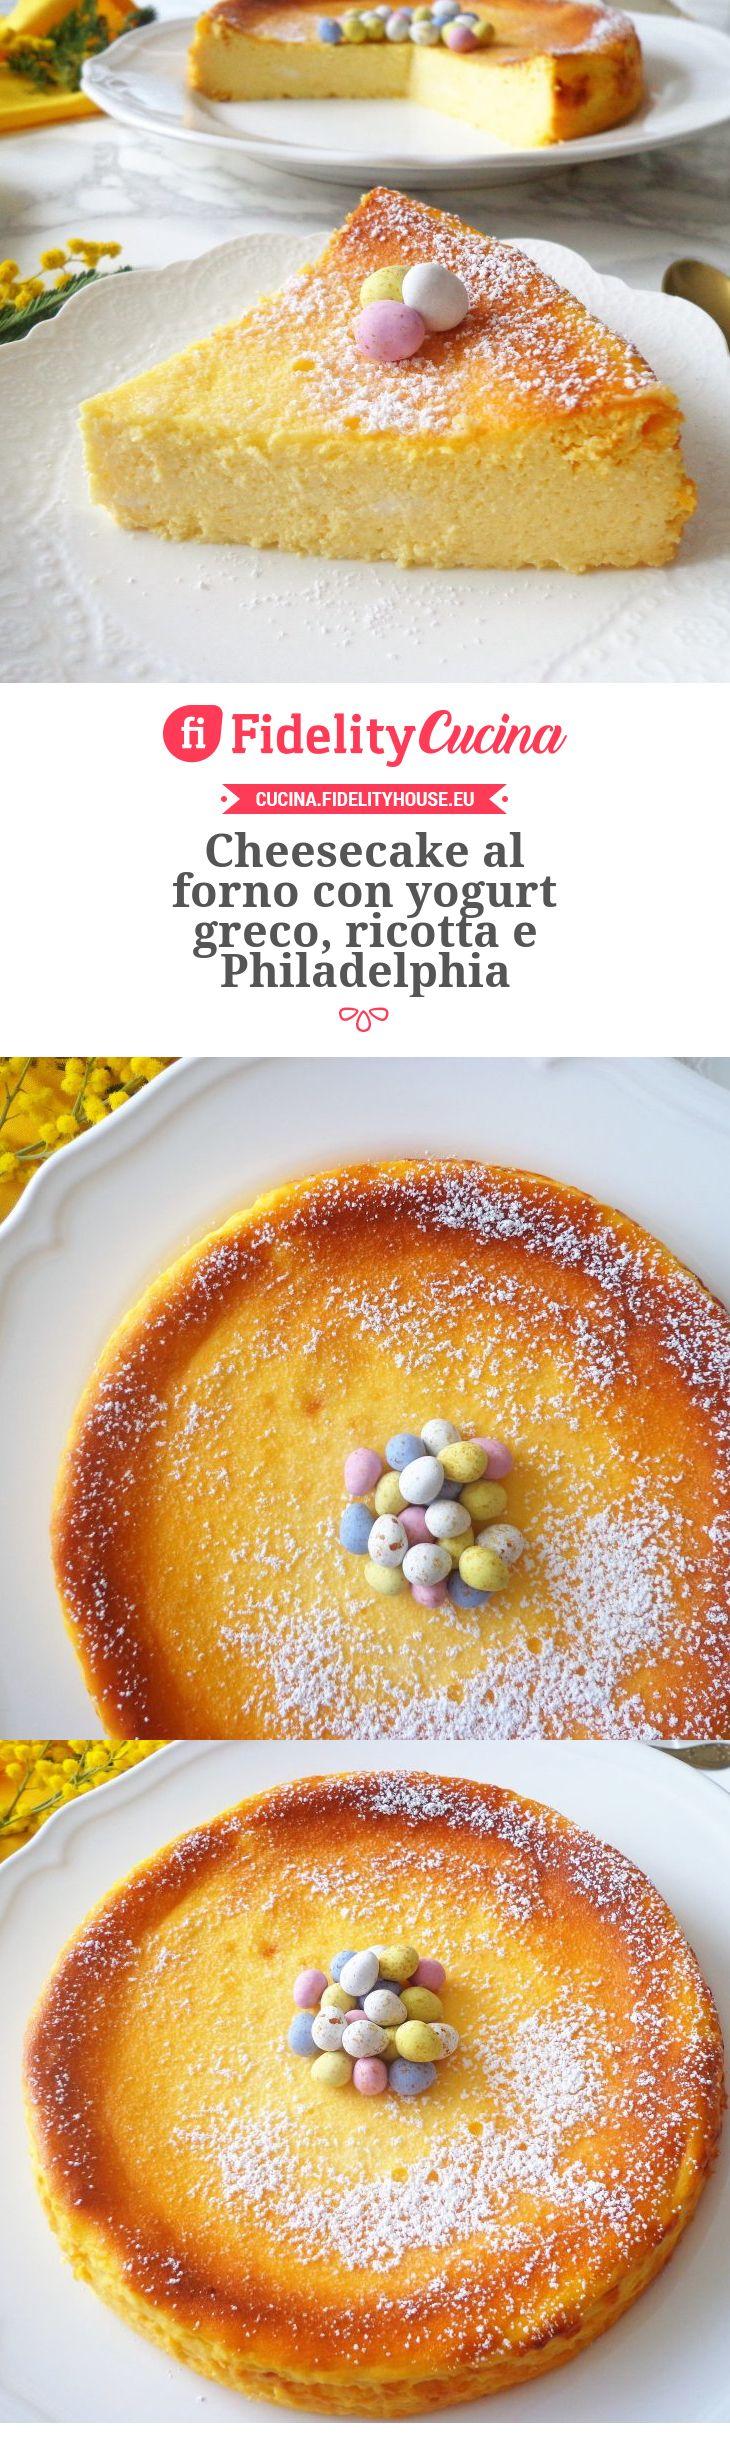 ac7d133f29691f4293bc8816ce25be2a - Ricette Yogurt Greco